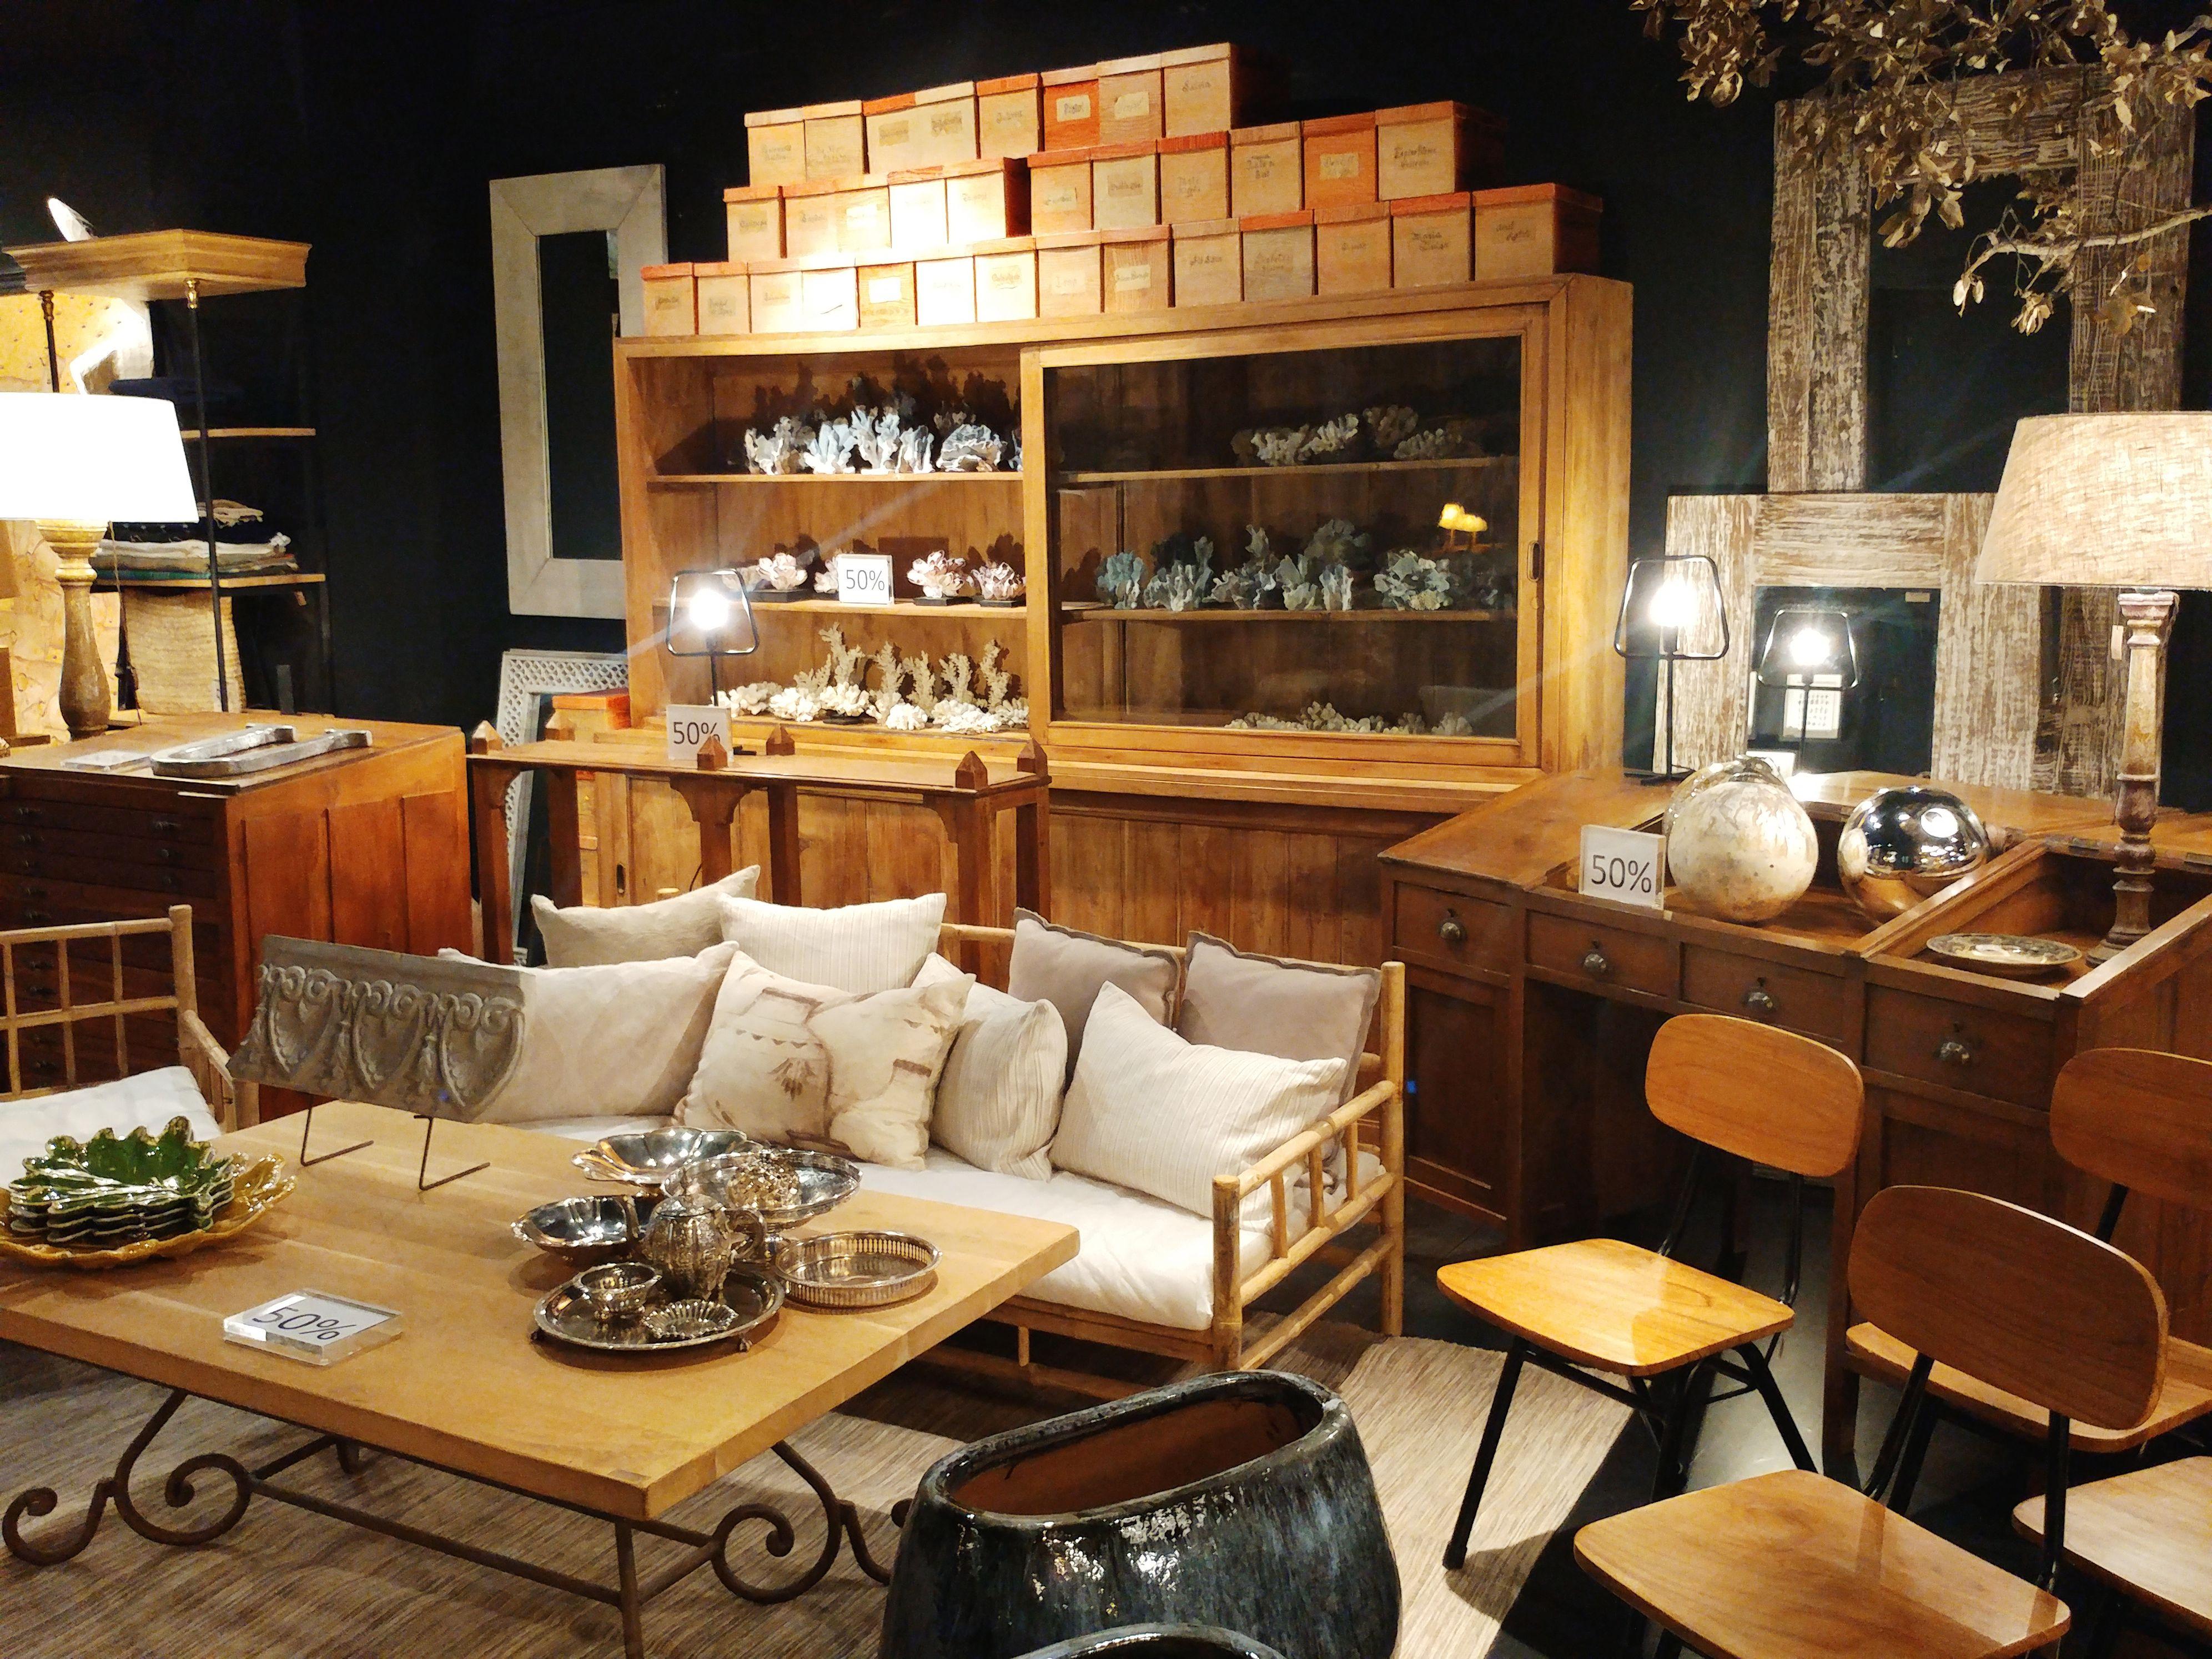 Azul Tierra luxurious furniture shop in Barcelona